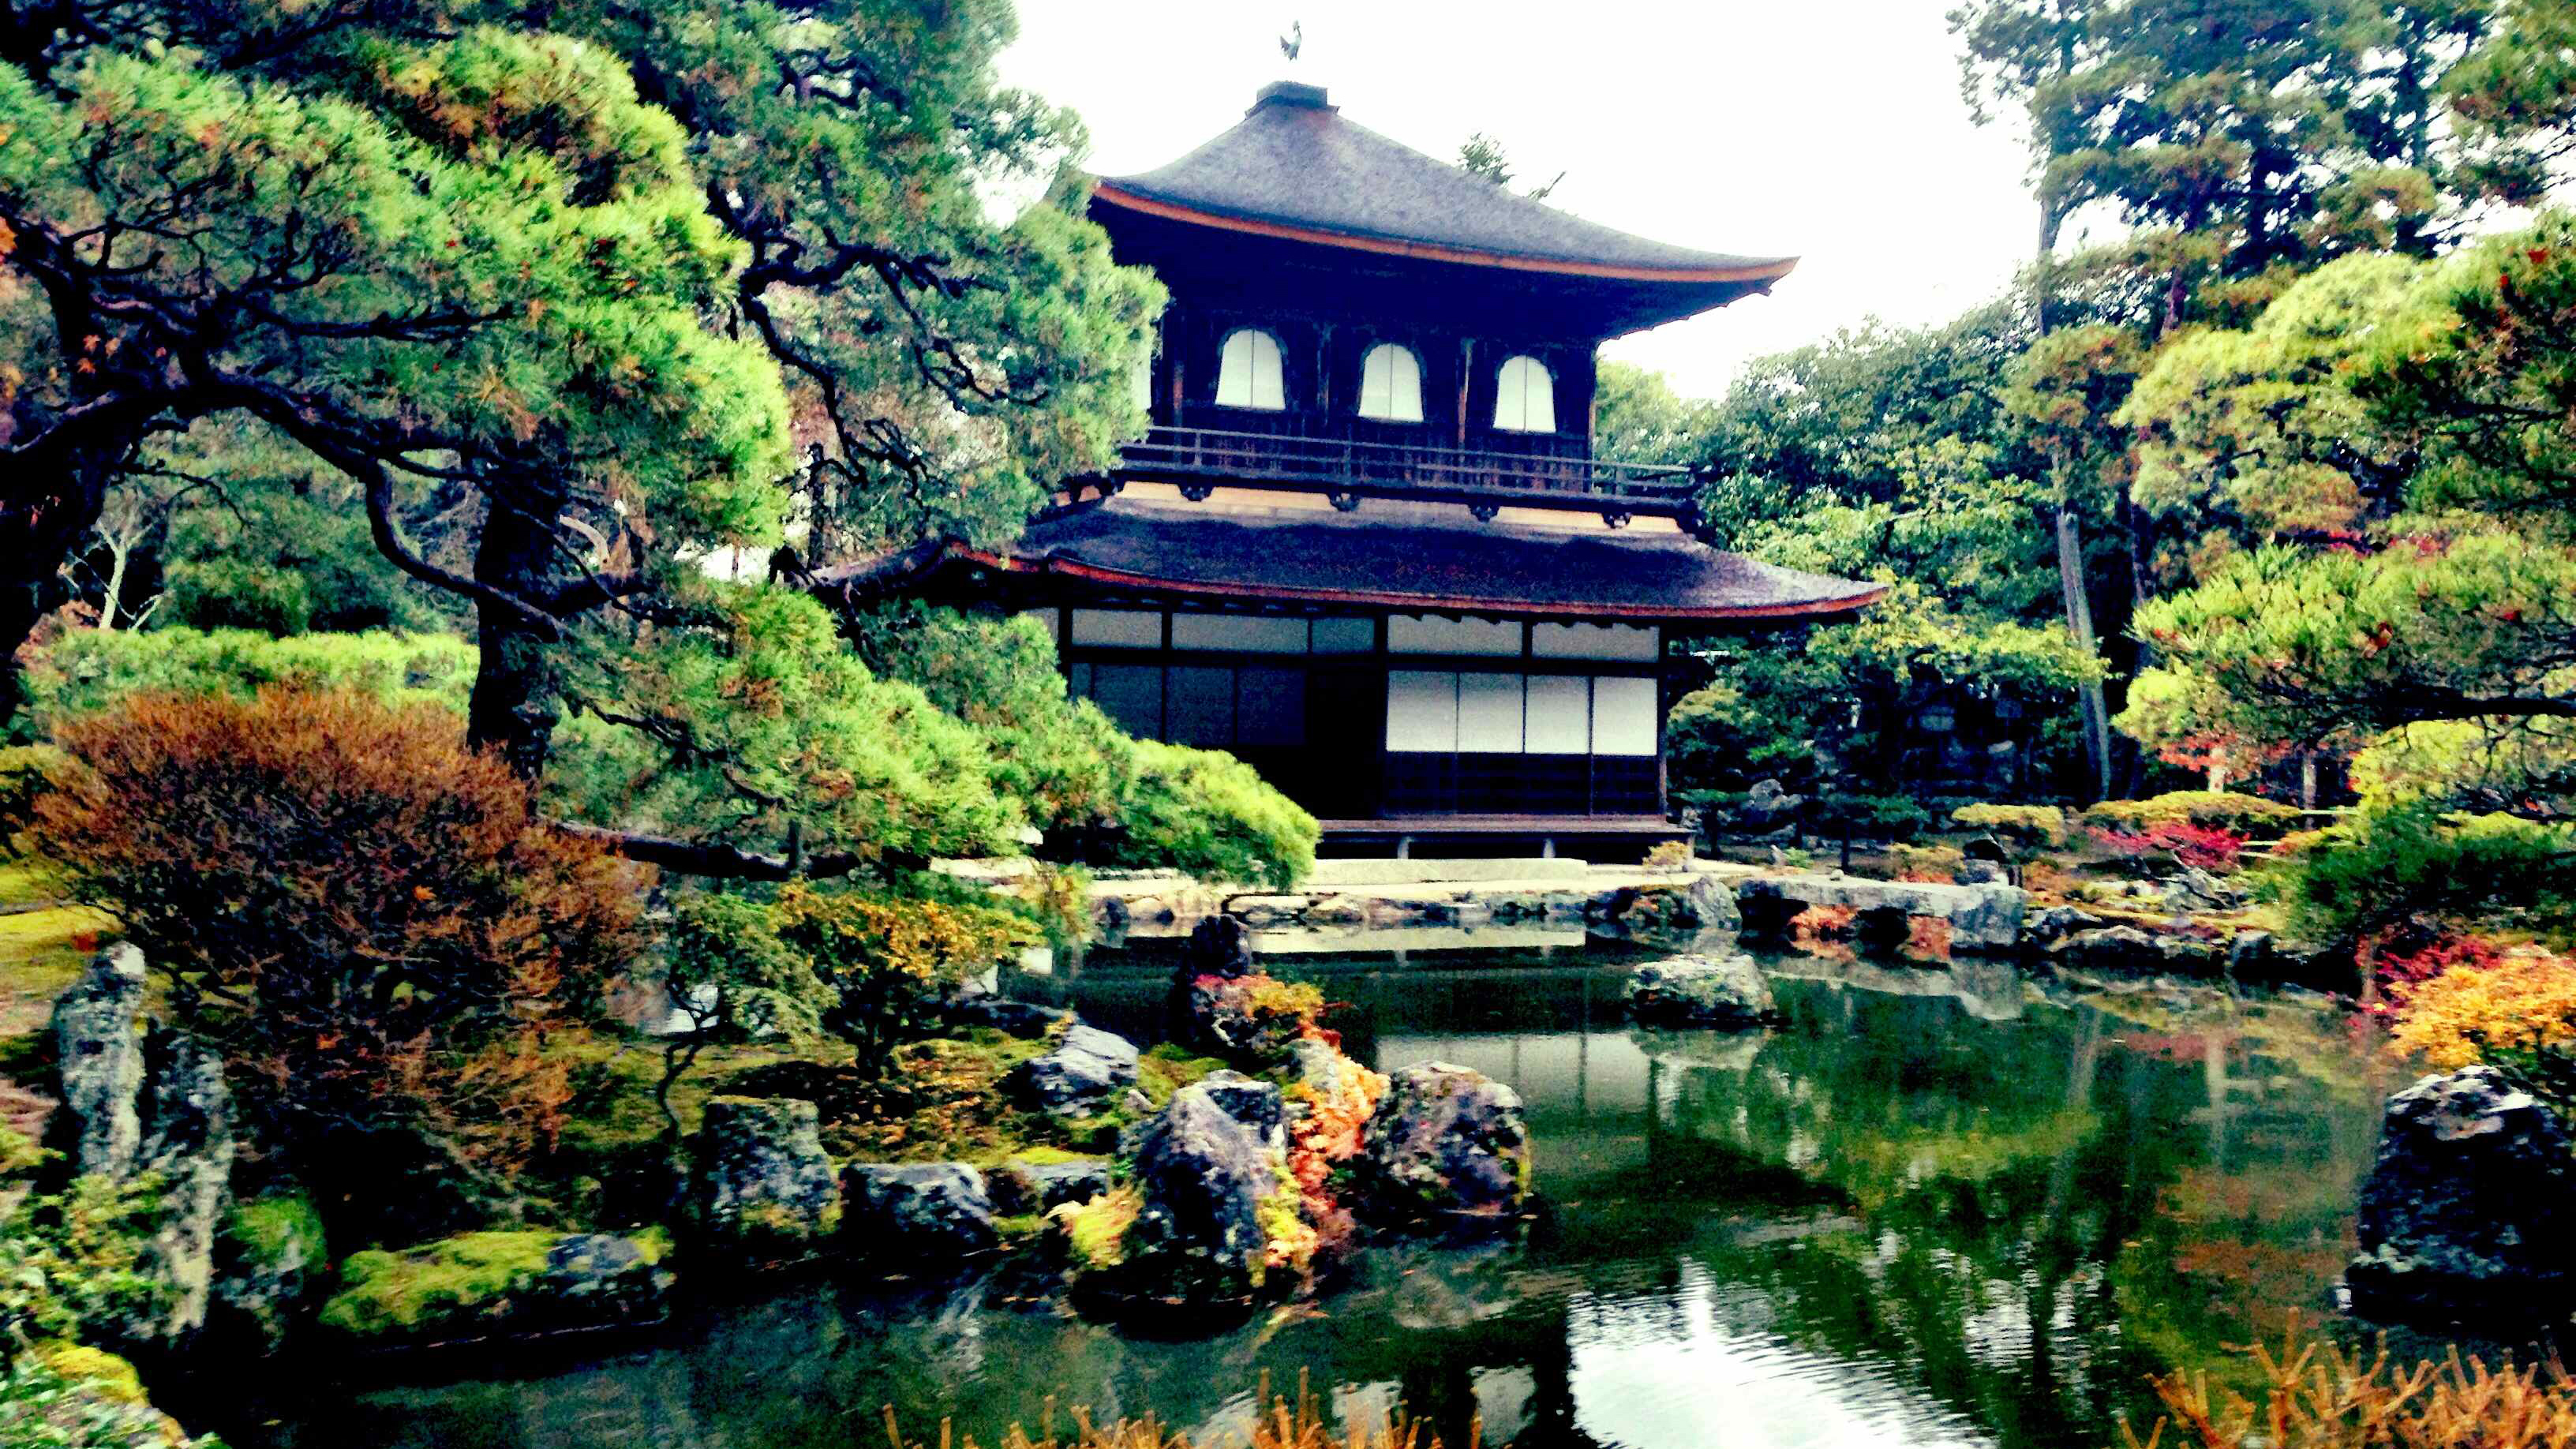 Kyoto Japan Ginkaku Ji Silver Pavilion Temple Zen Garden